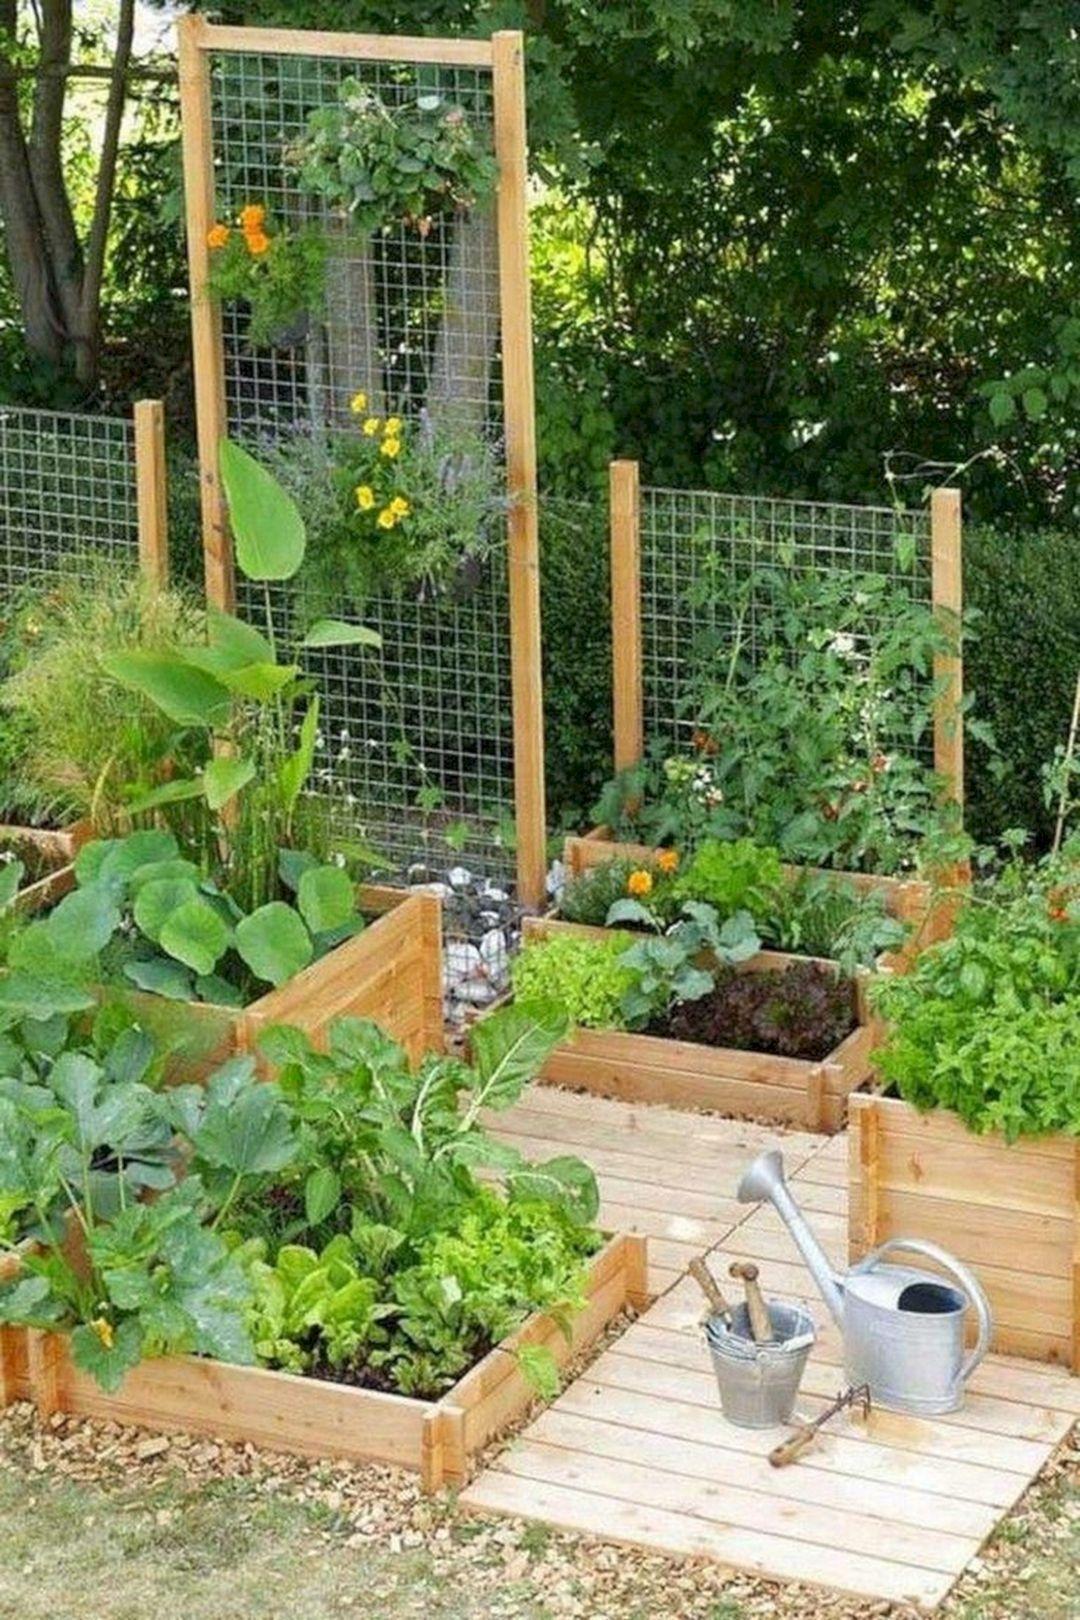 Rustic Vegetable Garden Design Ideas For Your Backyard Inspiration 27